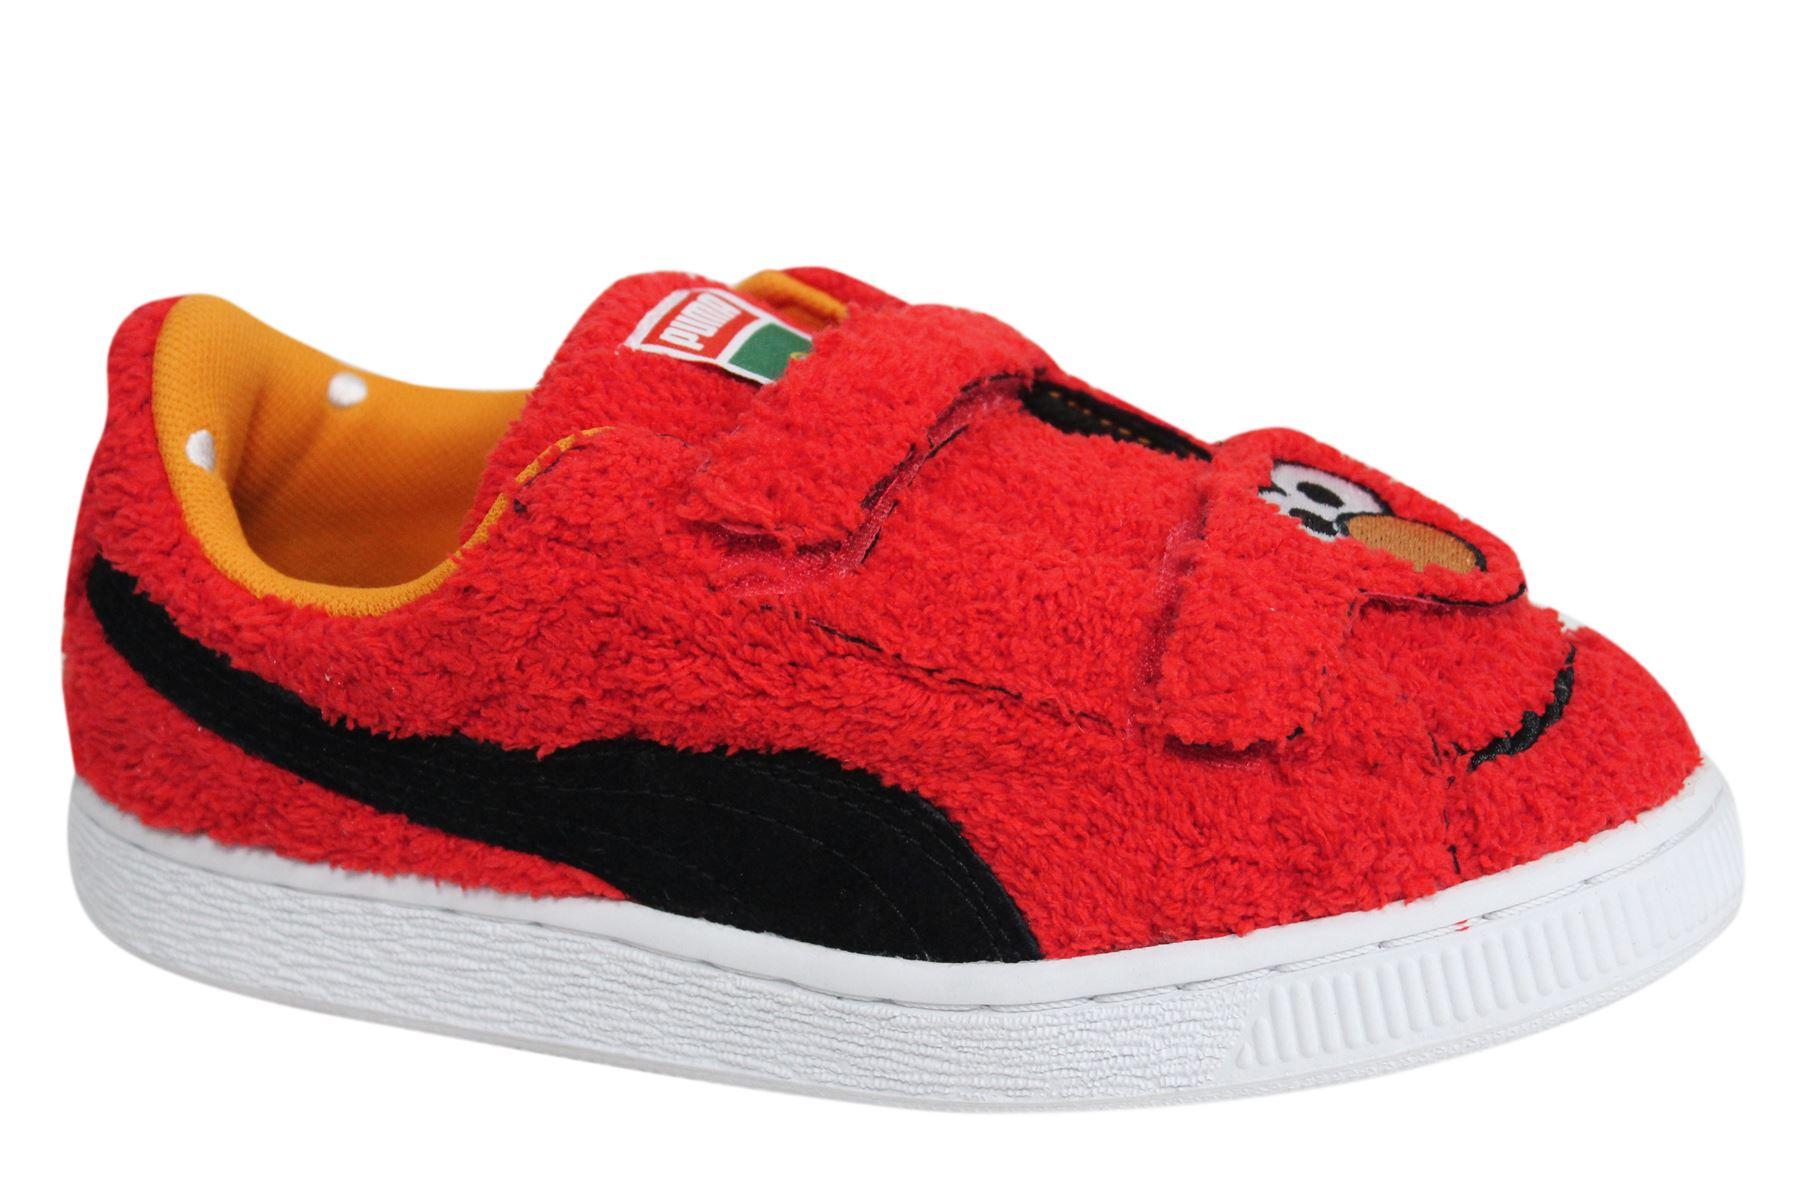 Details zu Puma Basket Sesame Street Elmo Statement Kids Trainers 362100 01 B2E